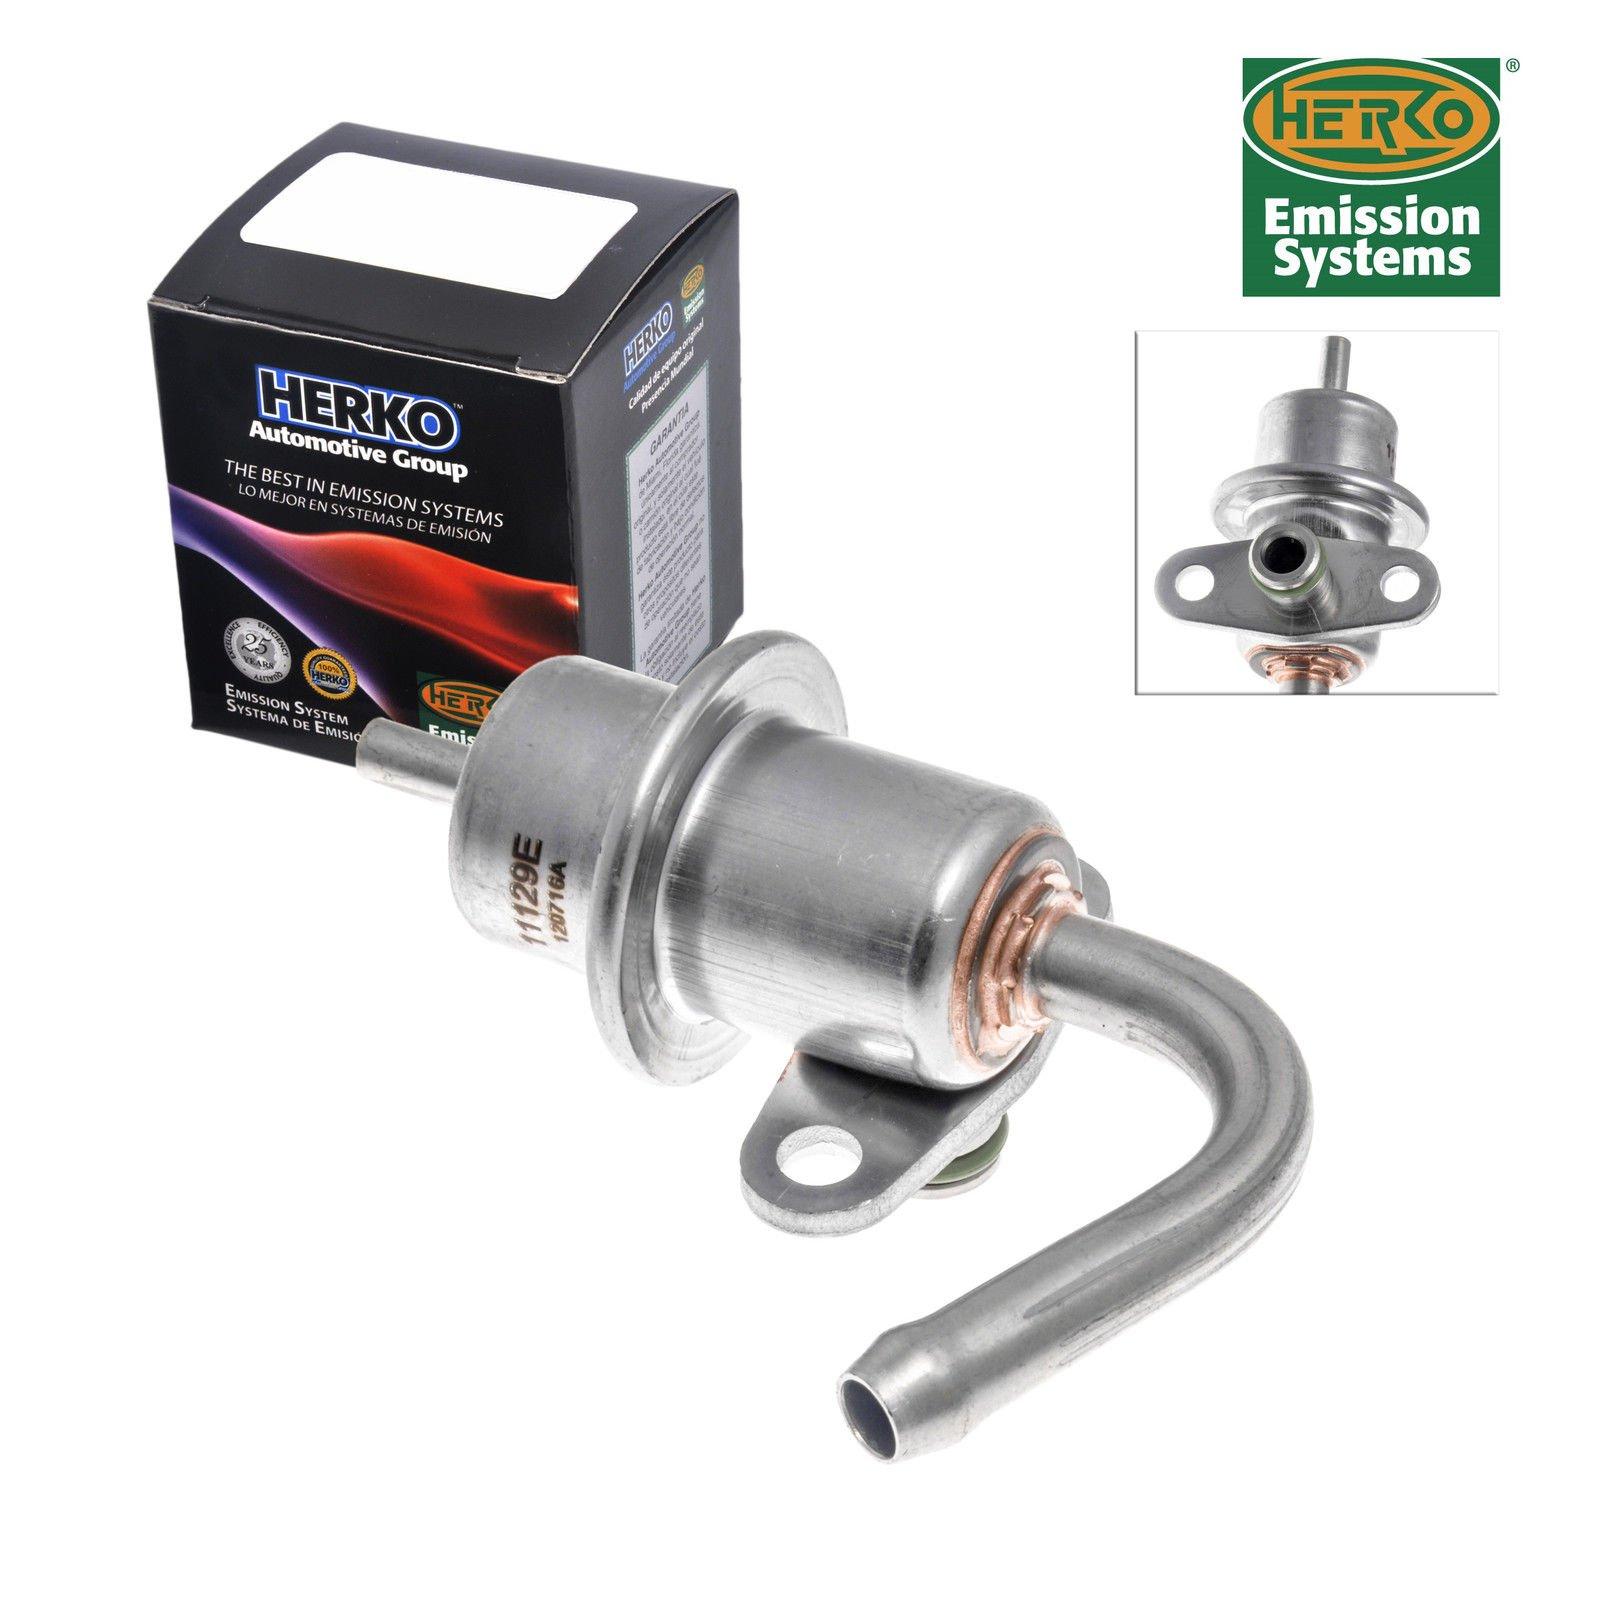 AD Auto Parts New Herko Fuel Pressure Regulator PR4107 for Nissan L4-2.4L 98-14